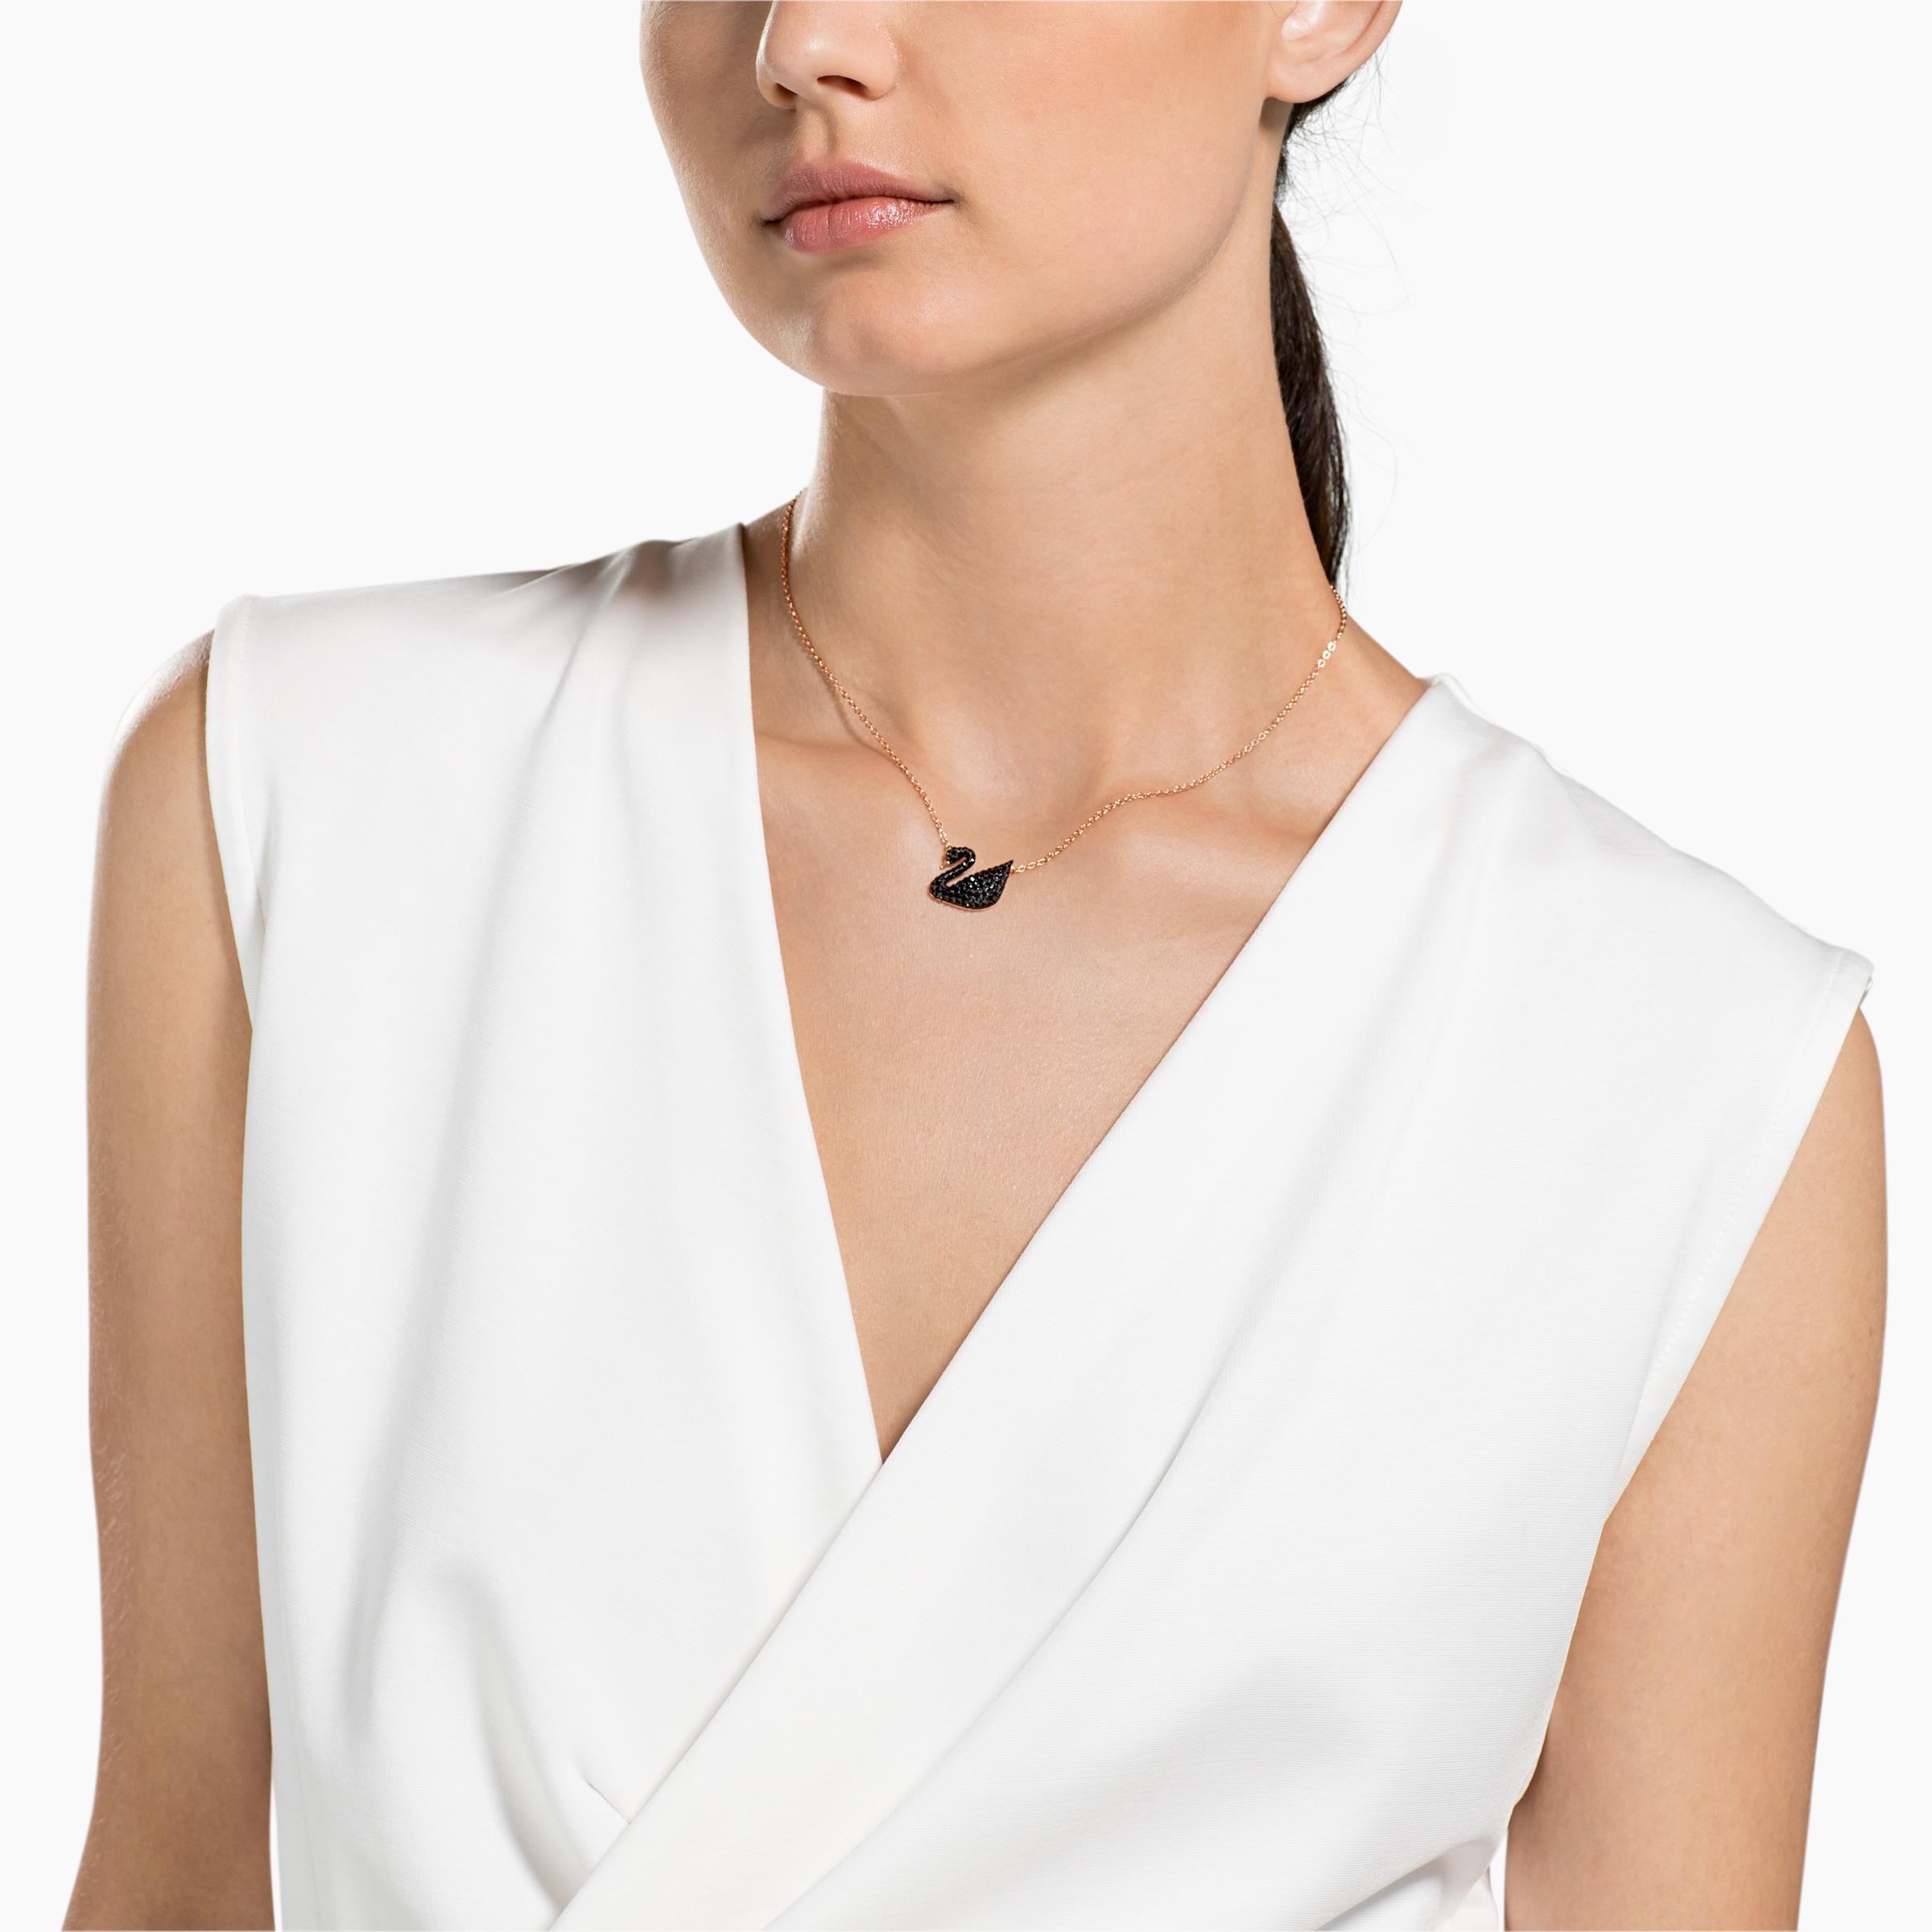 Pendentif Swarovski Iconic Swan, noir, Métal doré rose Swarovski